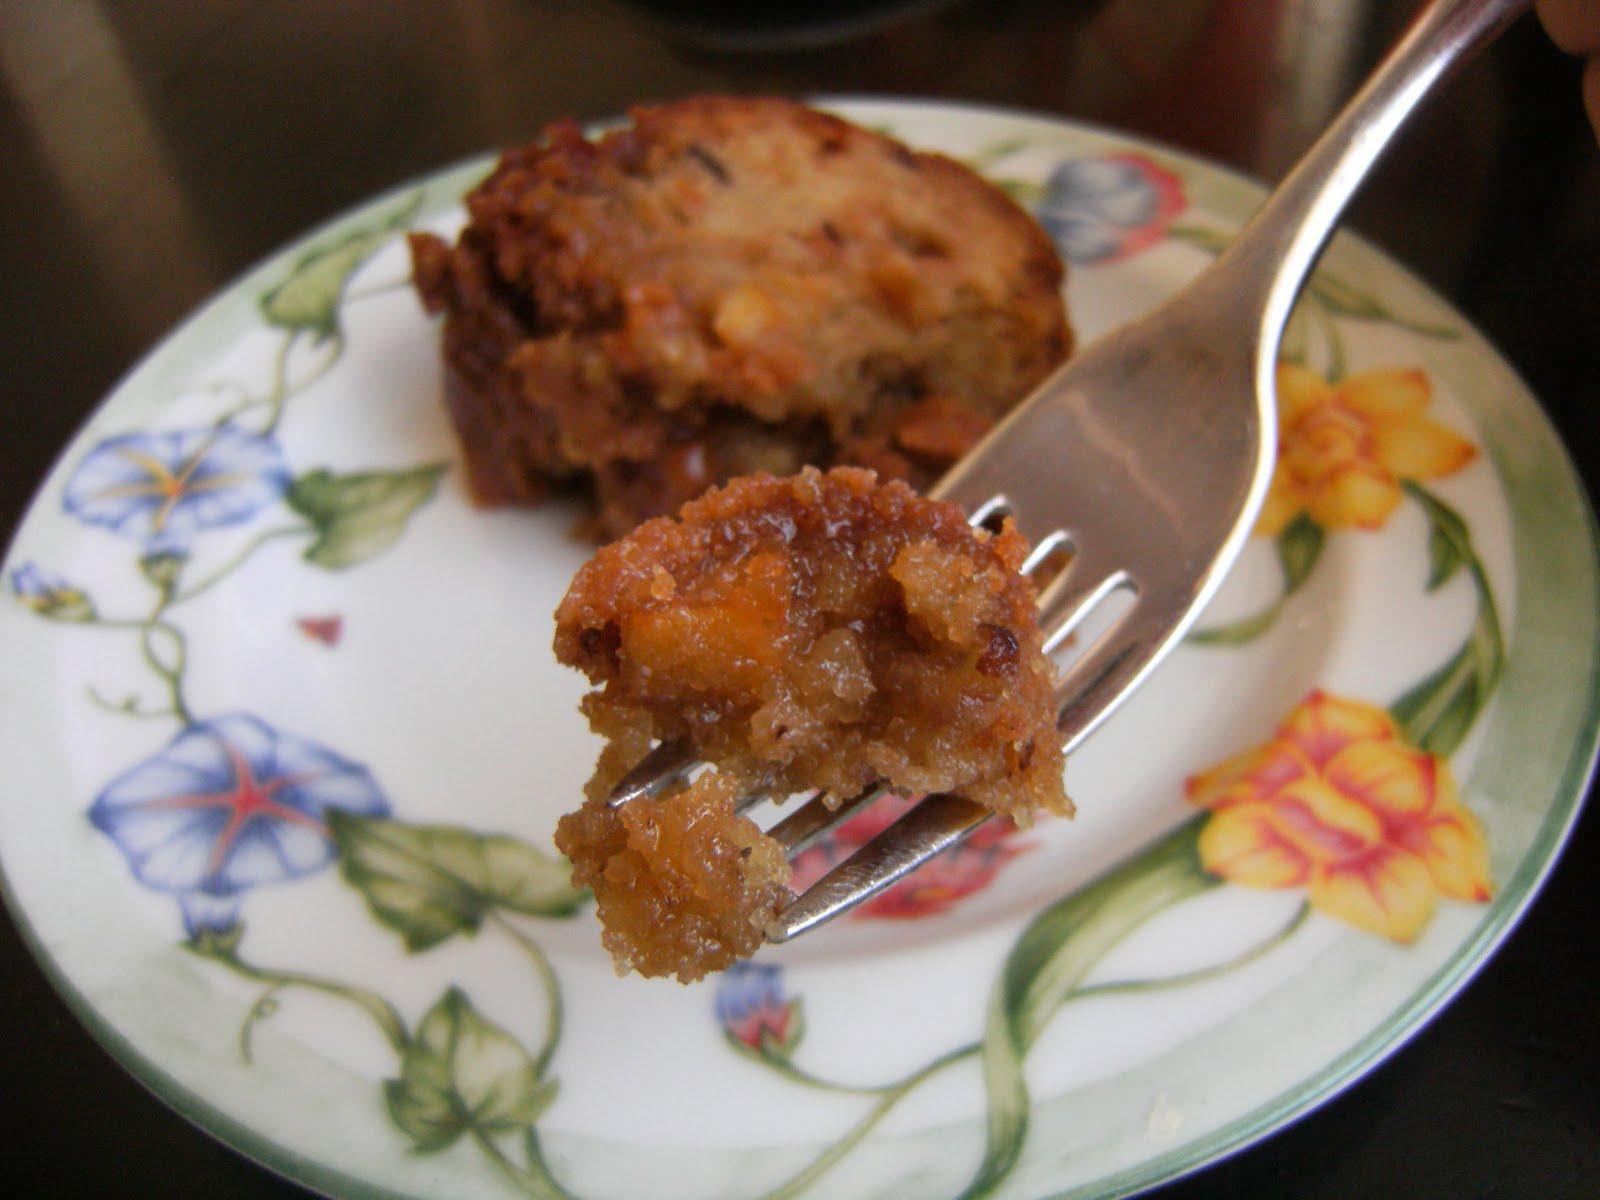 My Retro Kitchen: Apple Dapple Cake